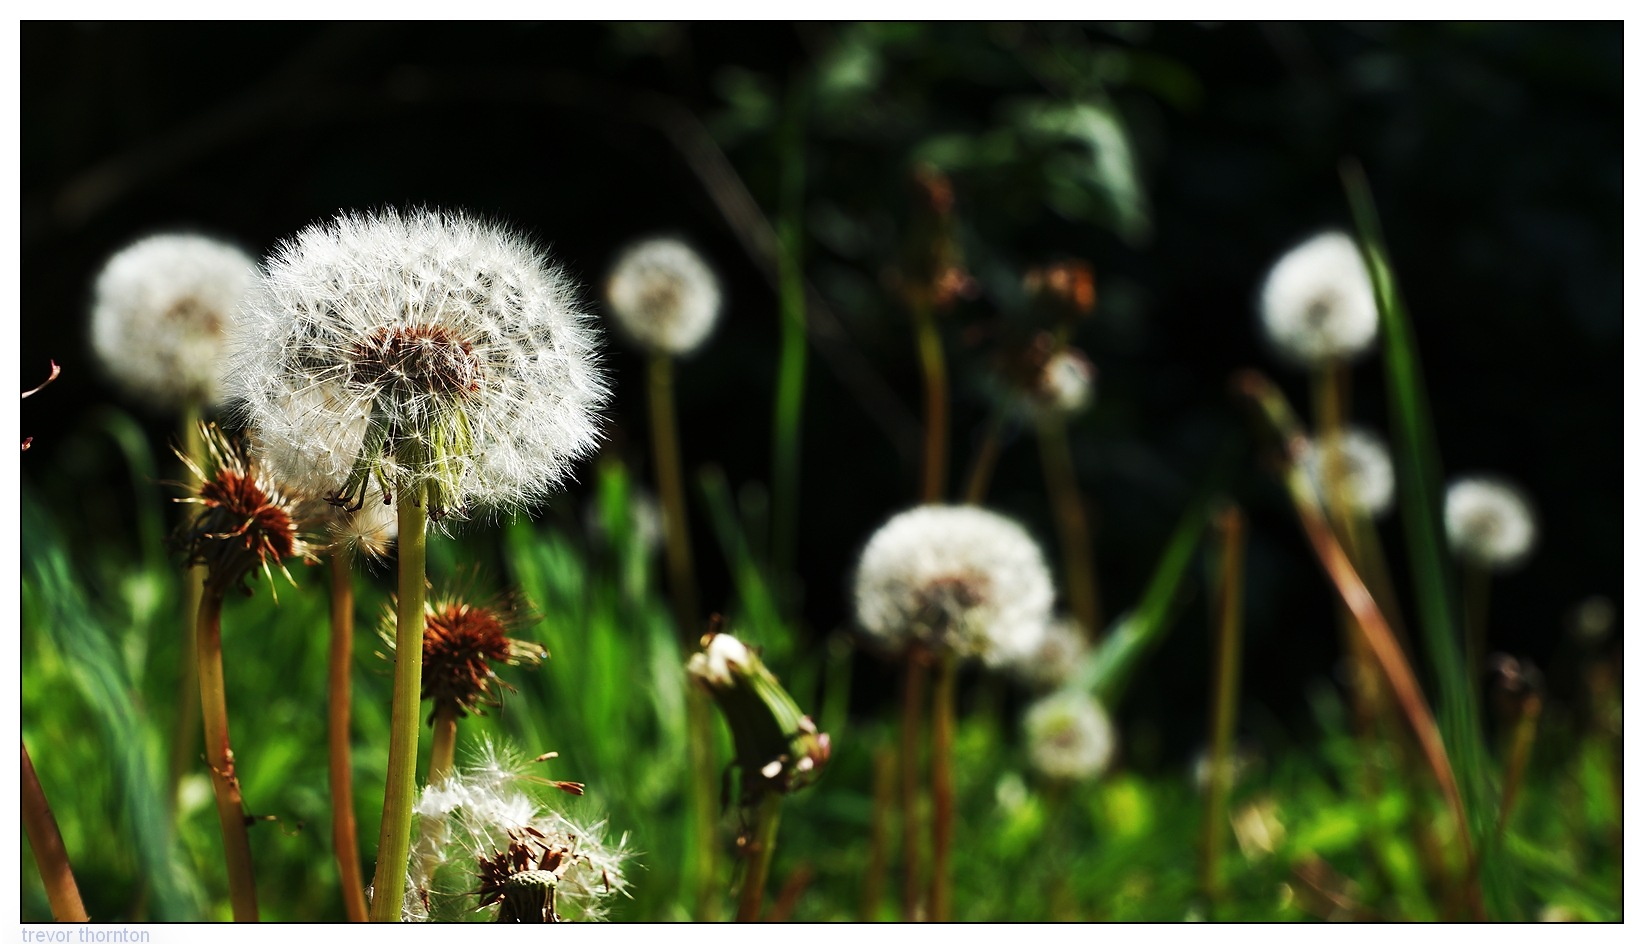 Dandelions by tpthornton